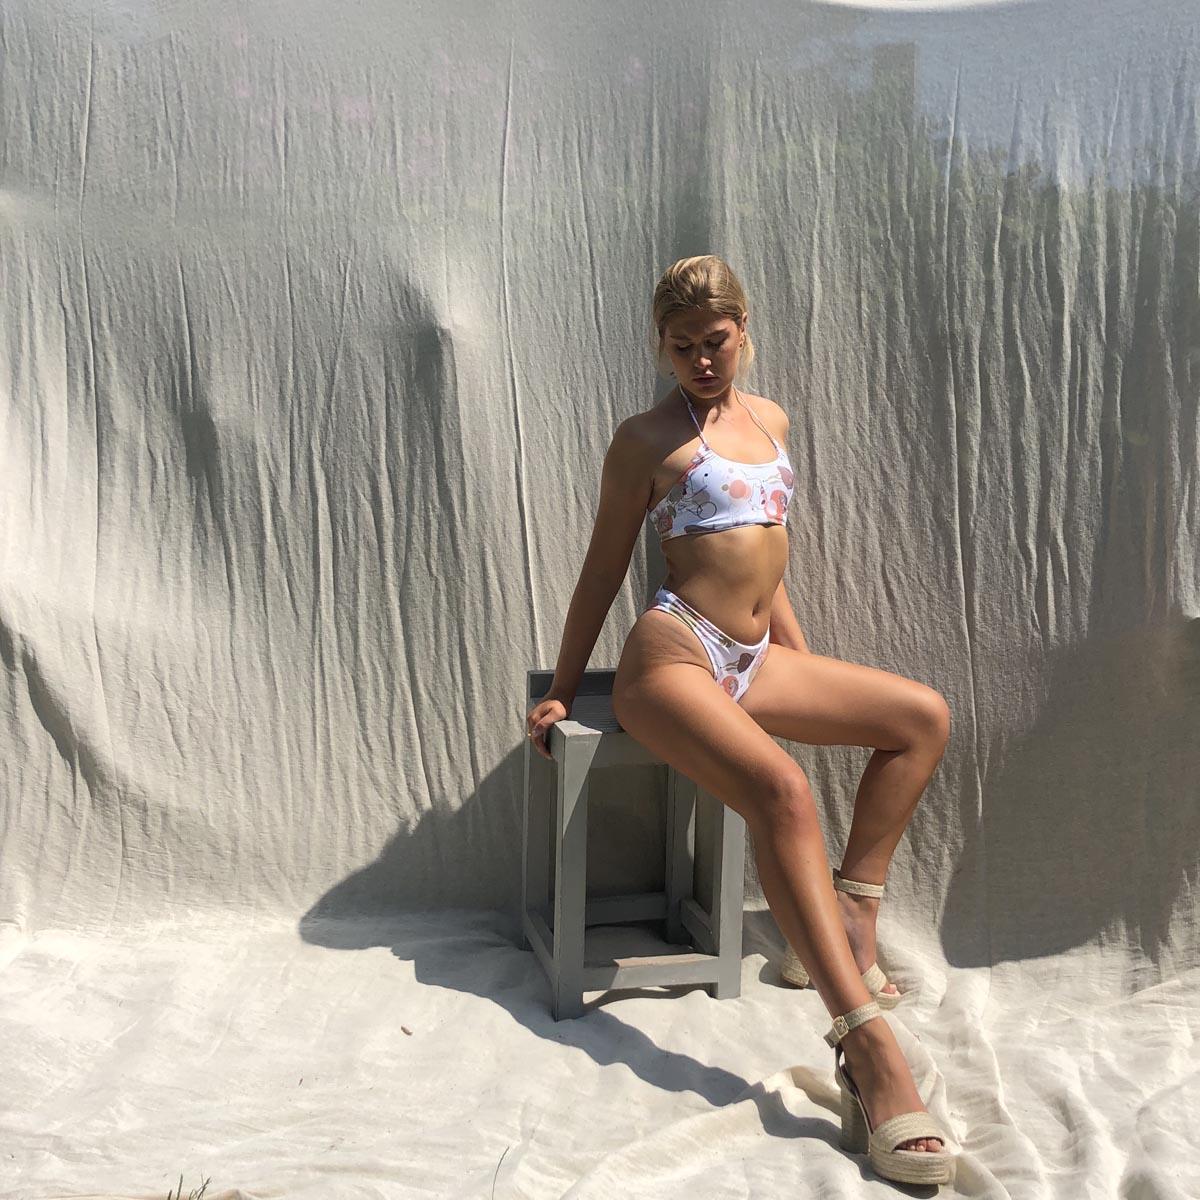 IMG 5228 1 - Abstract Bikini